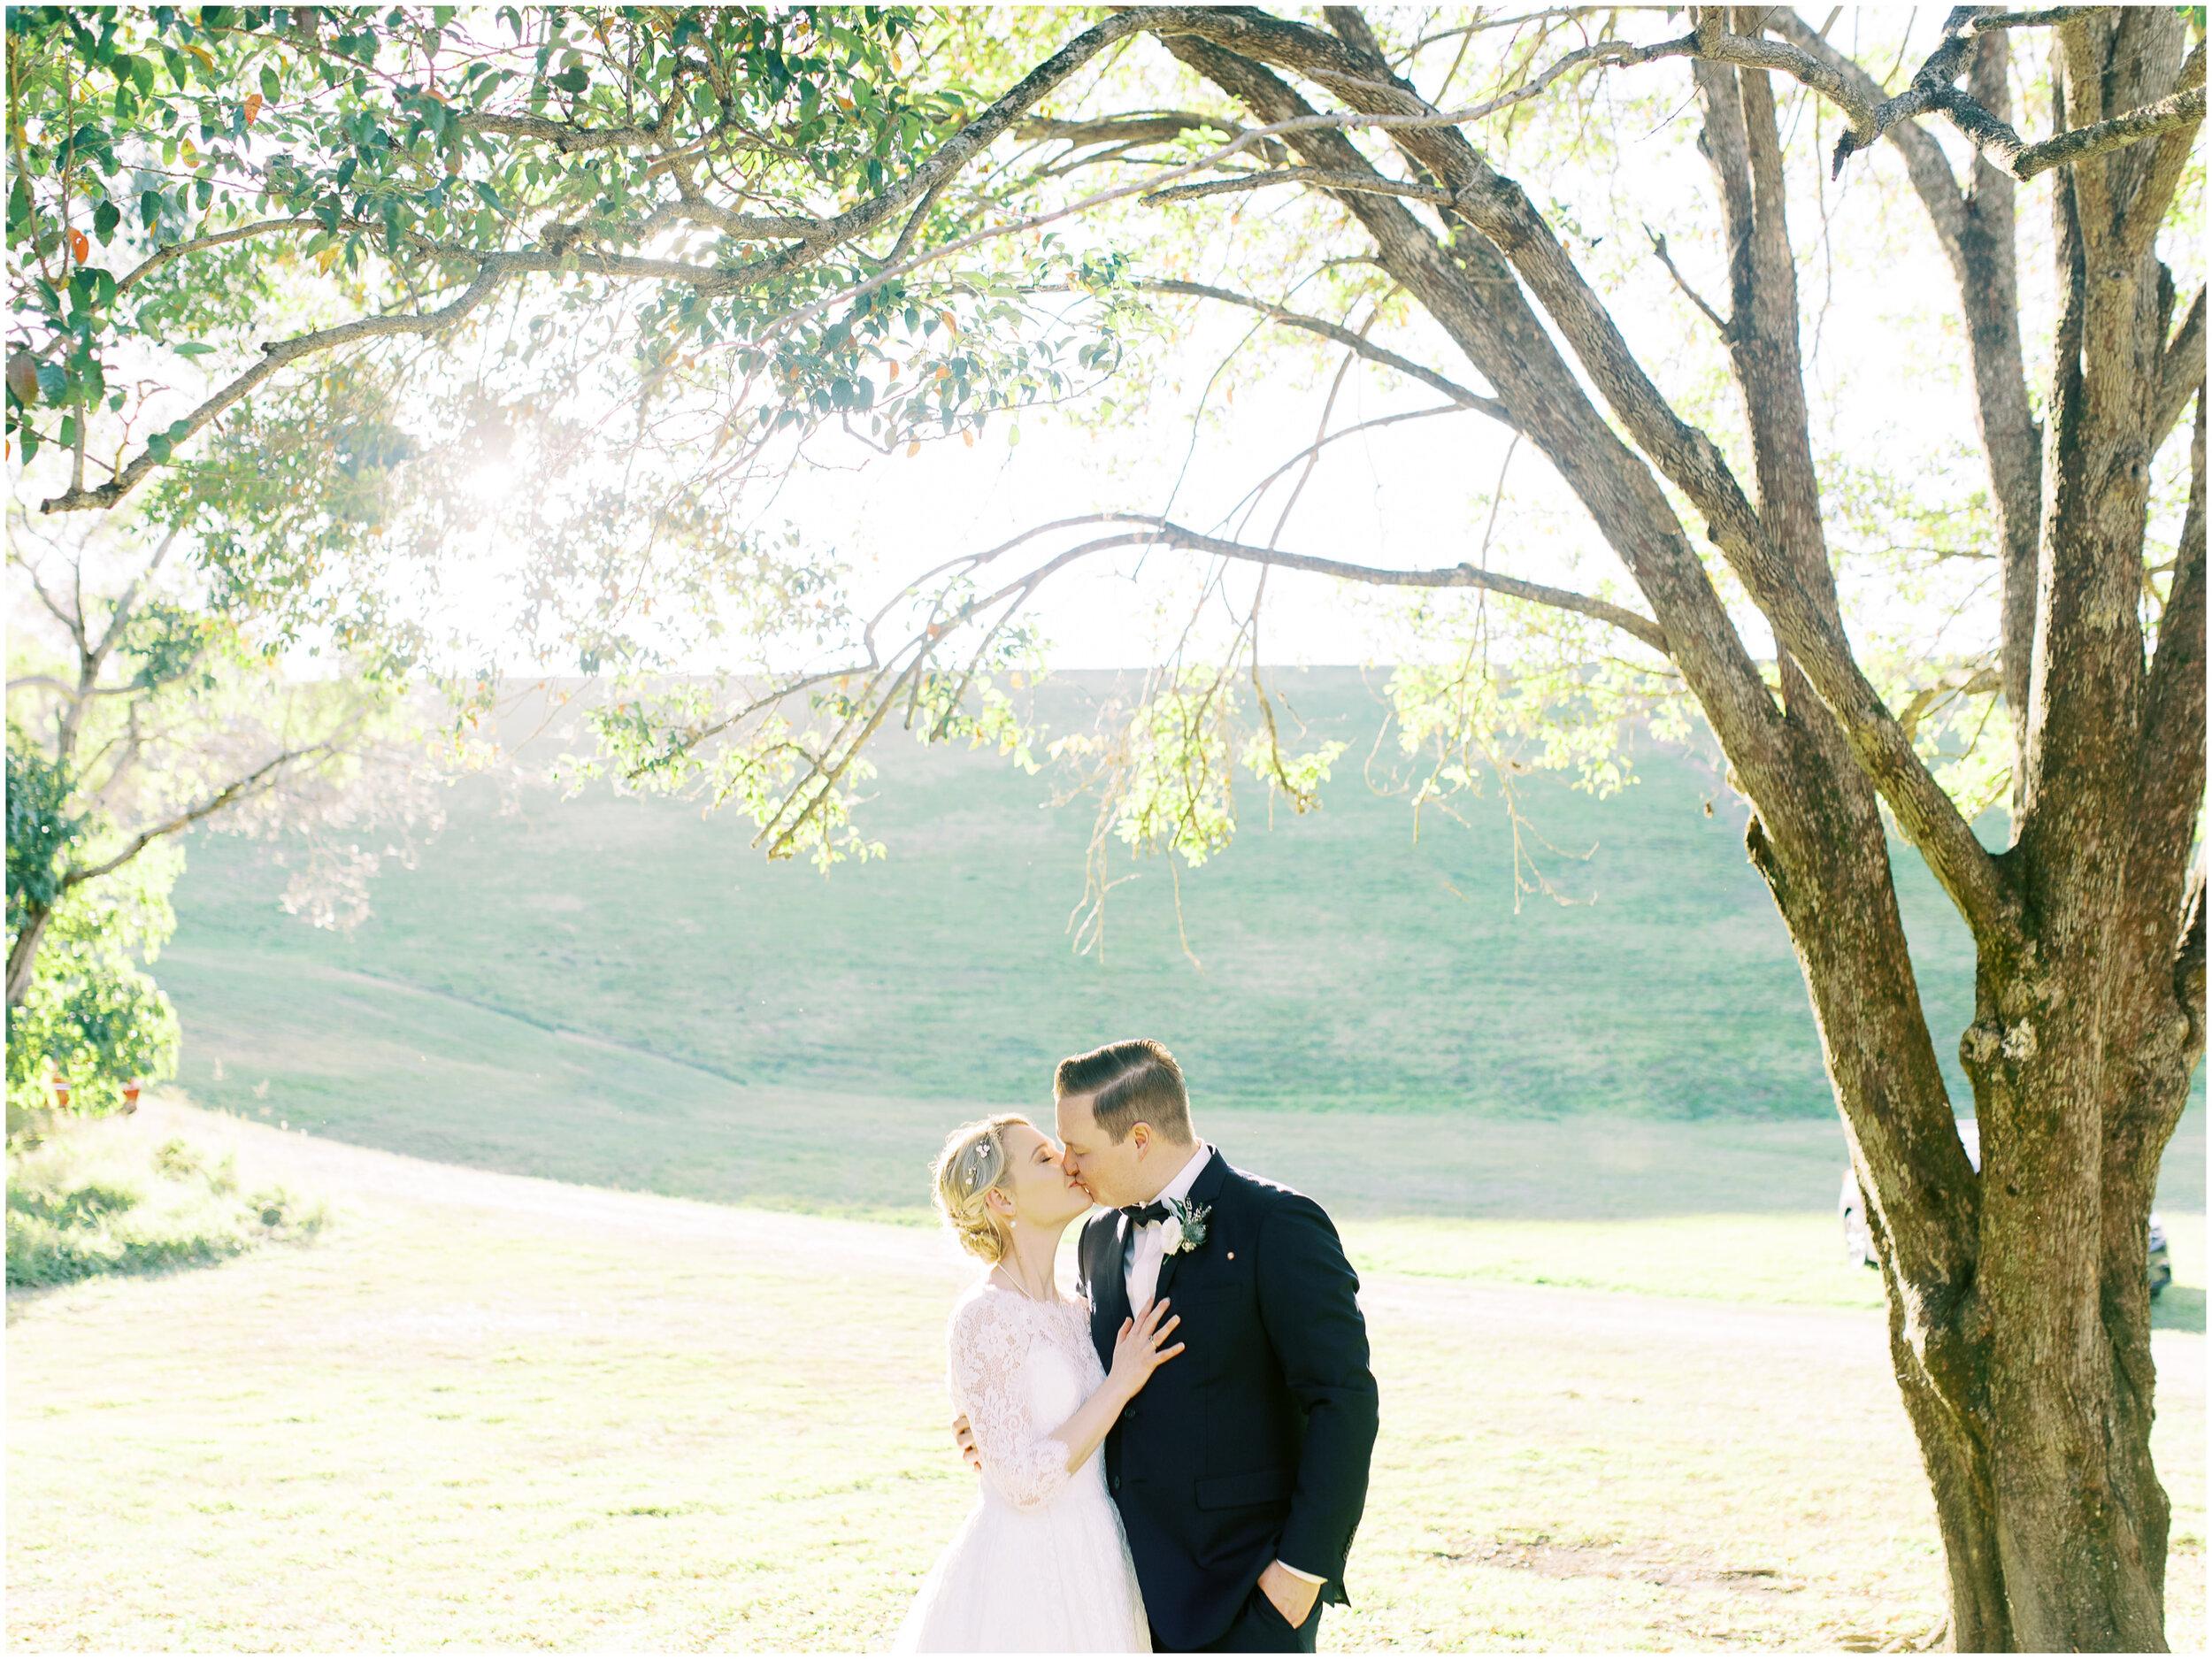 brisbane-film-wedding-photographer-lauren-olivia-luxury-wedding-australia-01-17.jpg